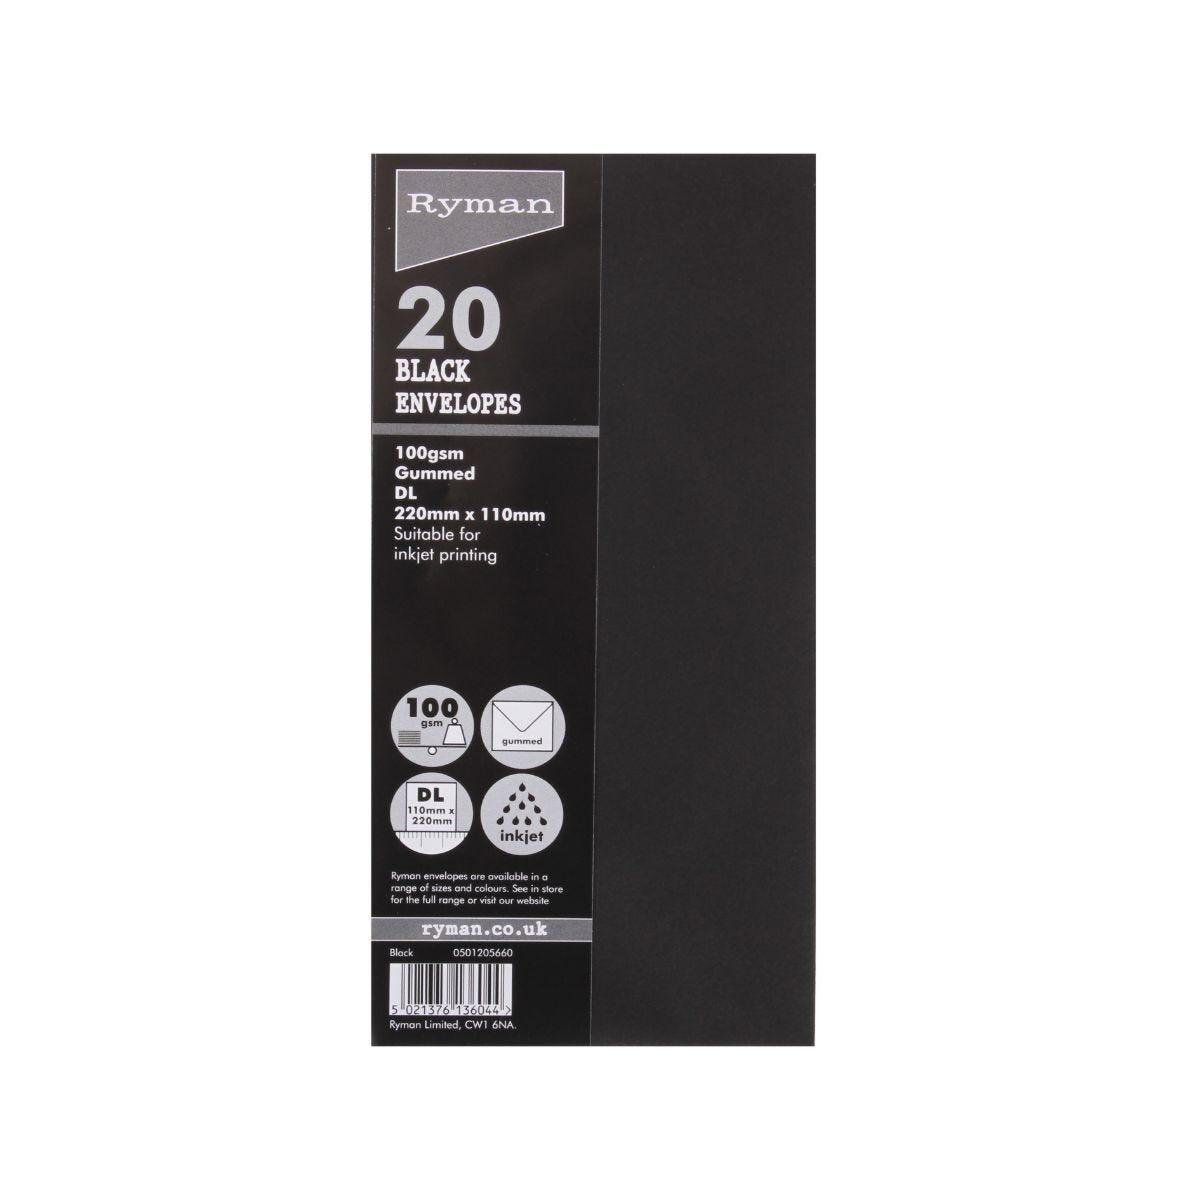 Ryman Envelopes 110x220mm 100gsm Pack of 20